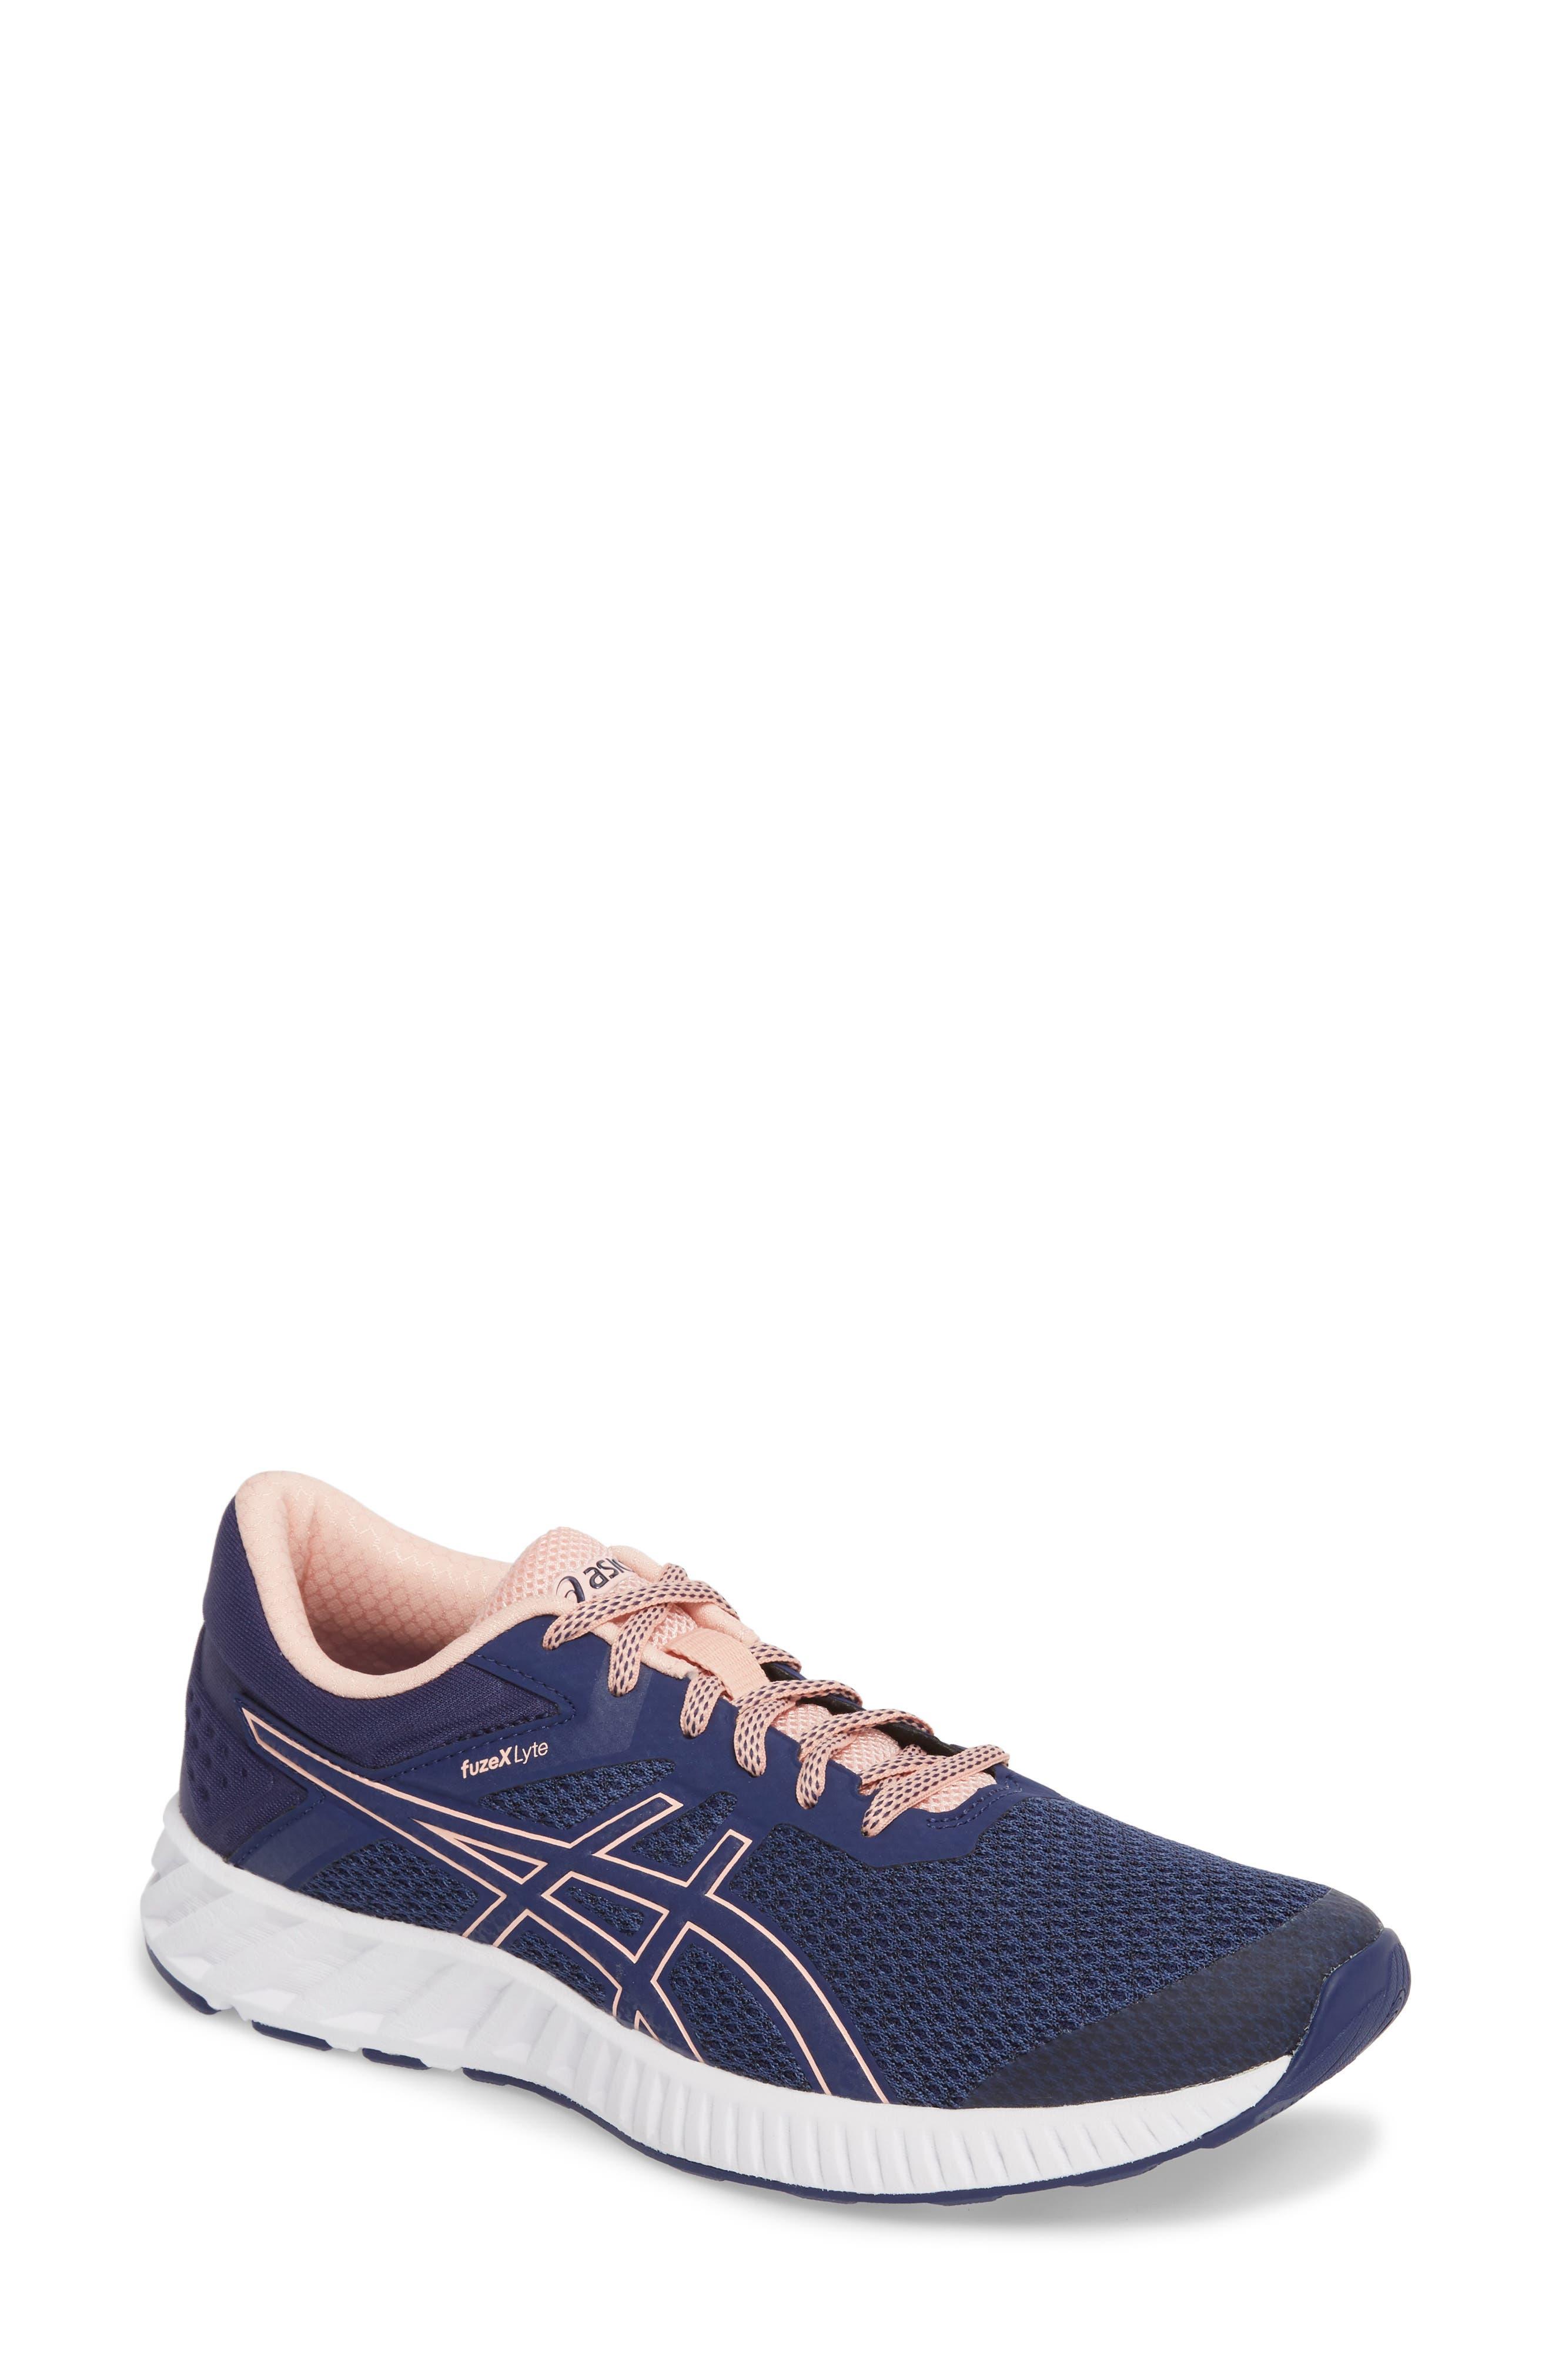 FuzeX Lyte 2 Running Shoe,                             Main thumbnail 1, color,                             INDIGO BLUE/ FROSTED ROSE